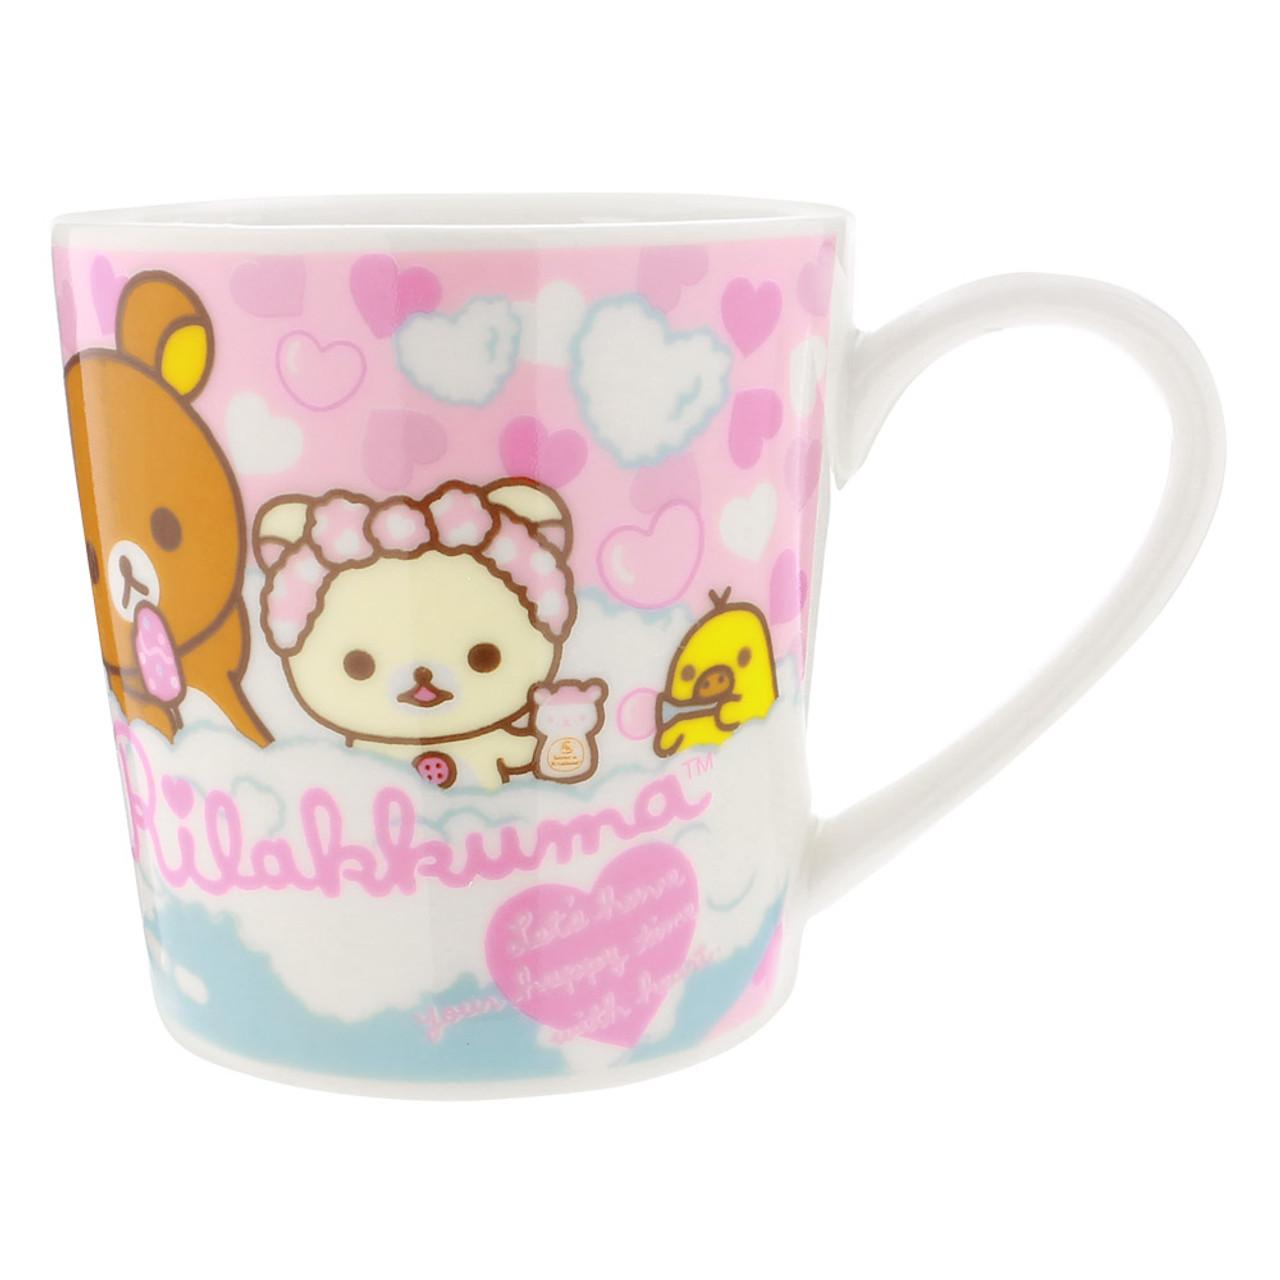 San-x Rilakkuma Bath Time Light Pink Ceramic Mug - Heart ( Front View )